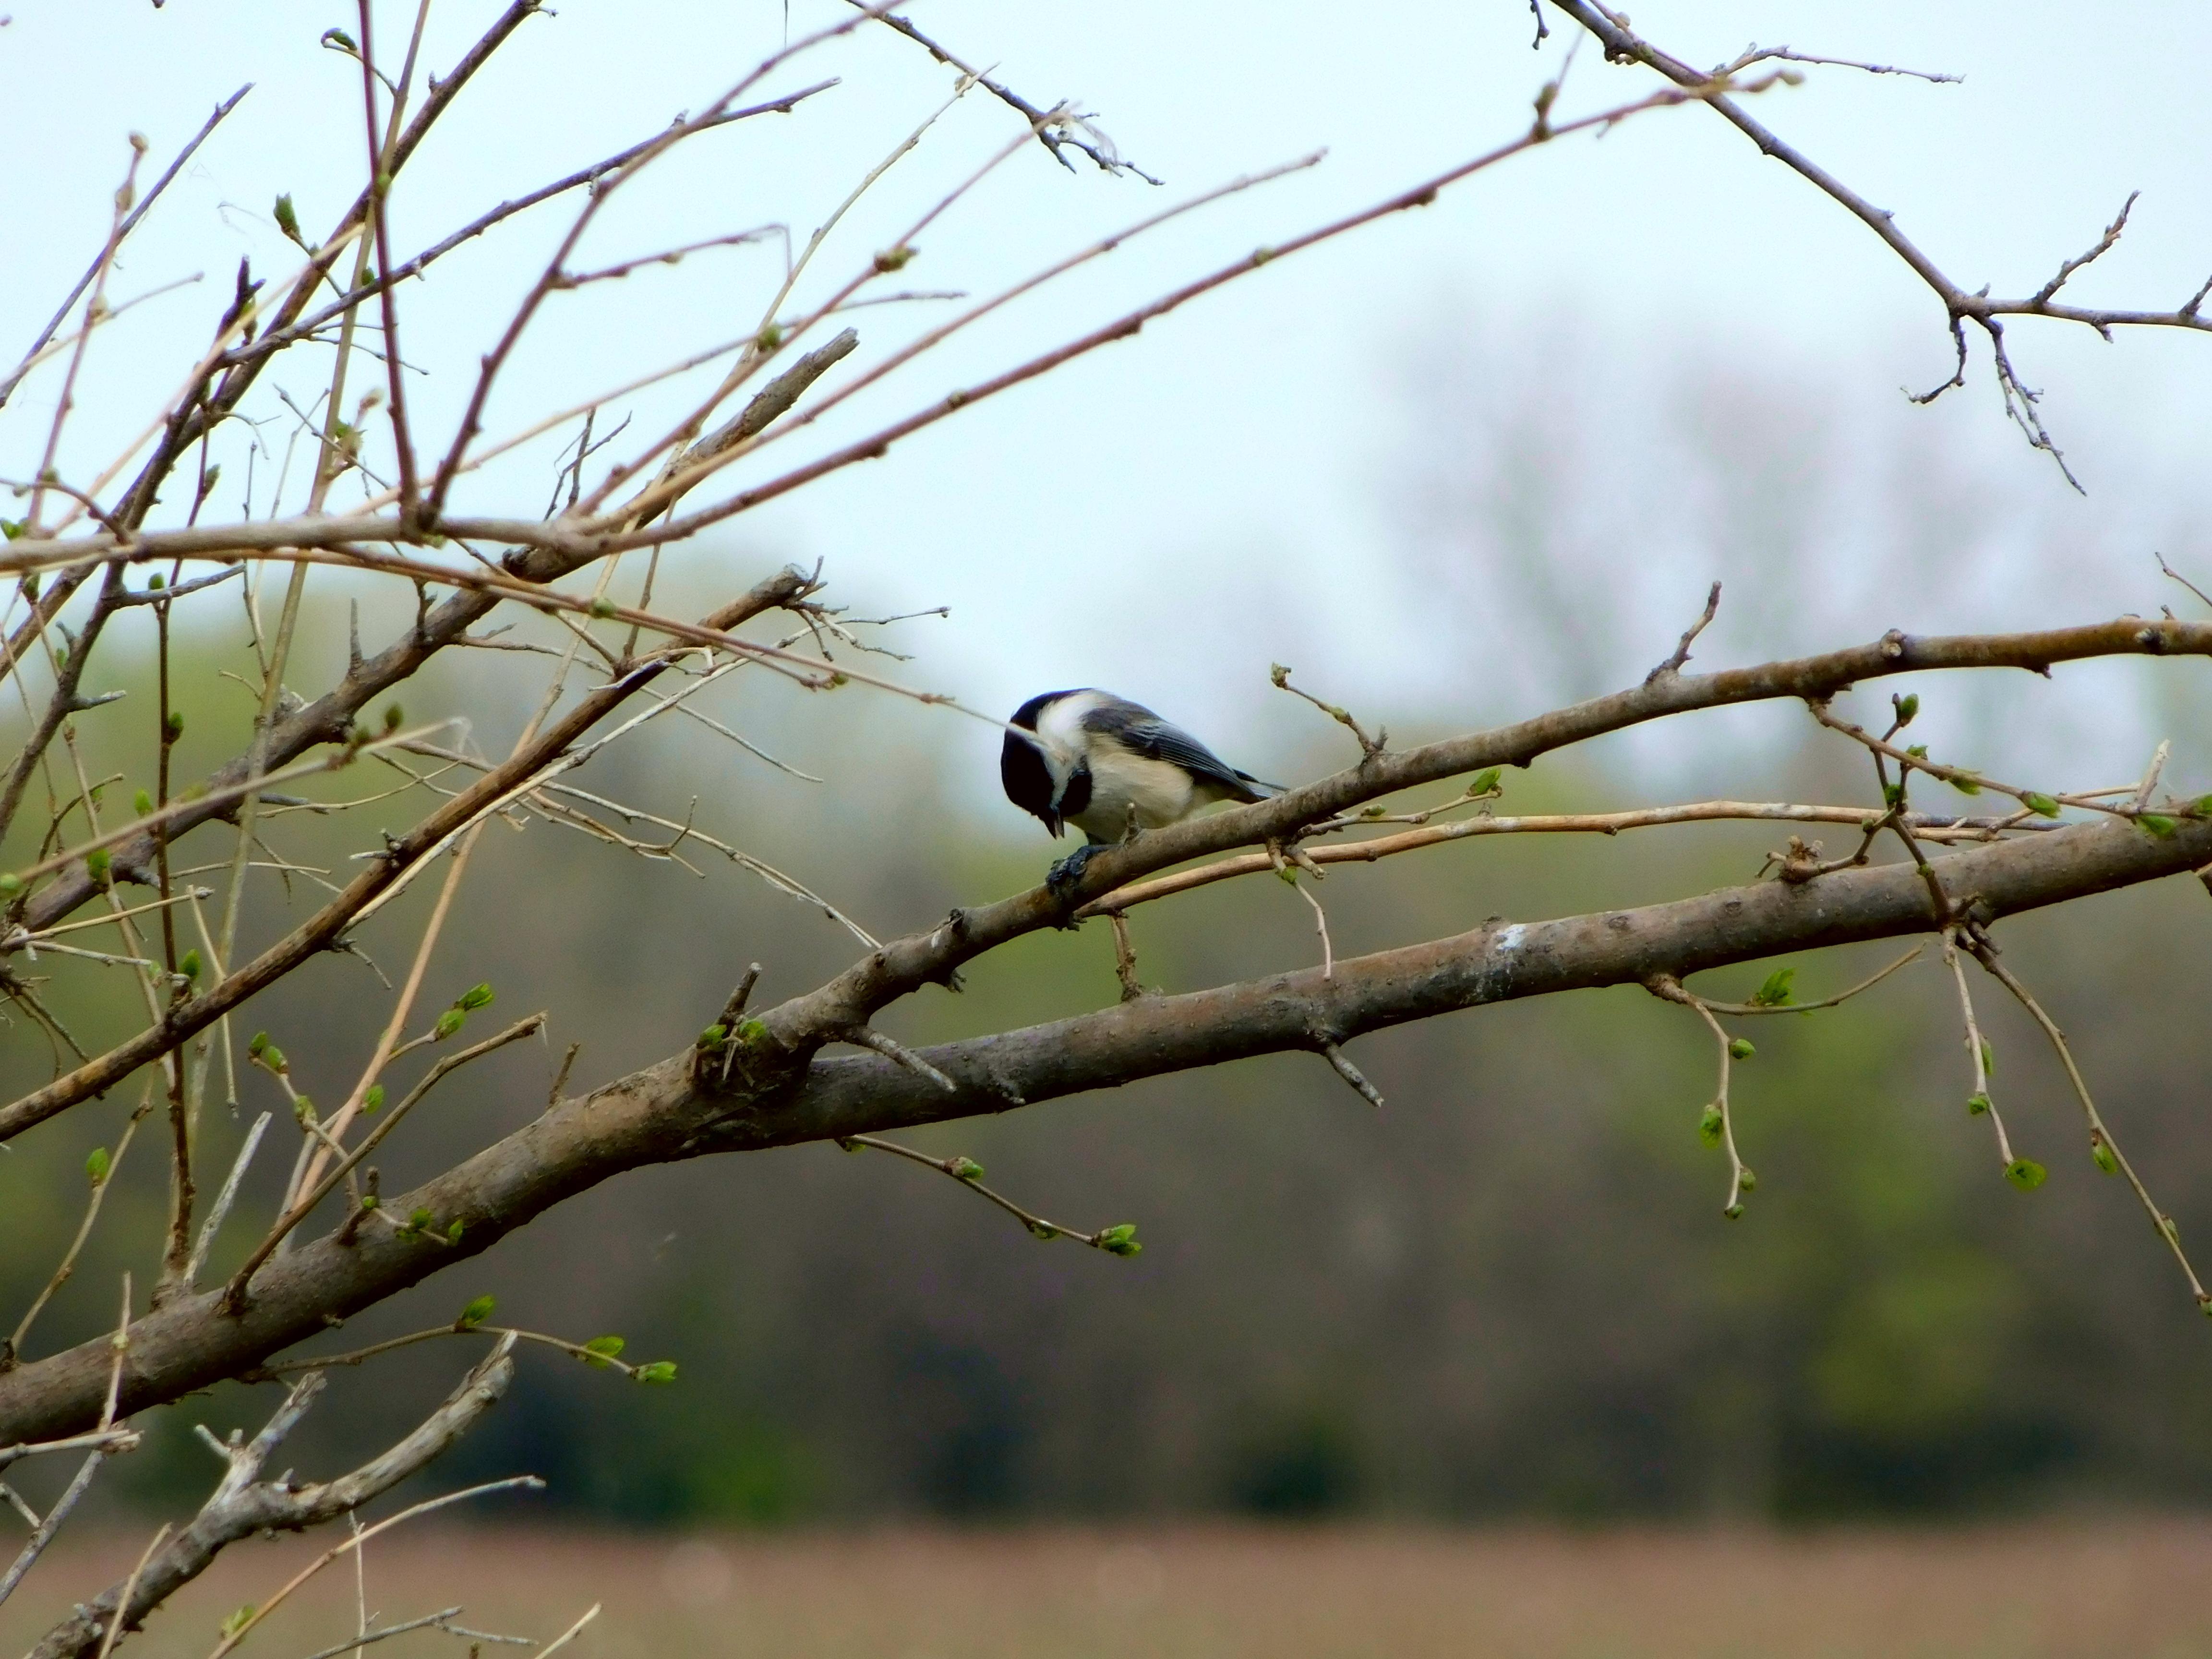 Chickadee opens a seed